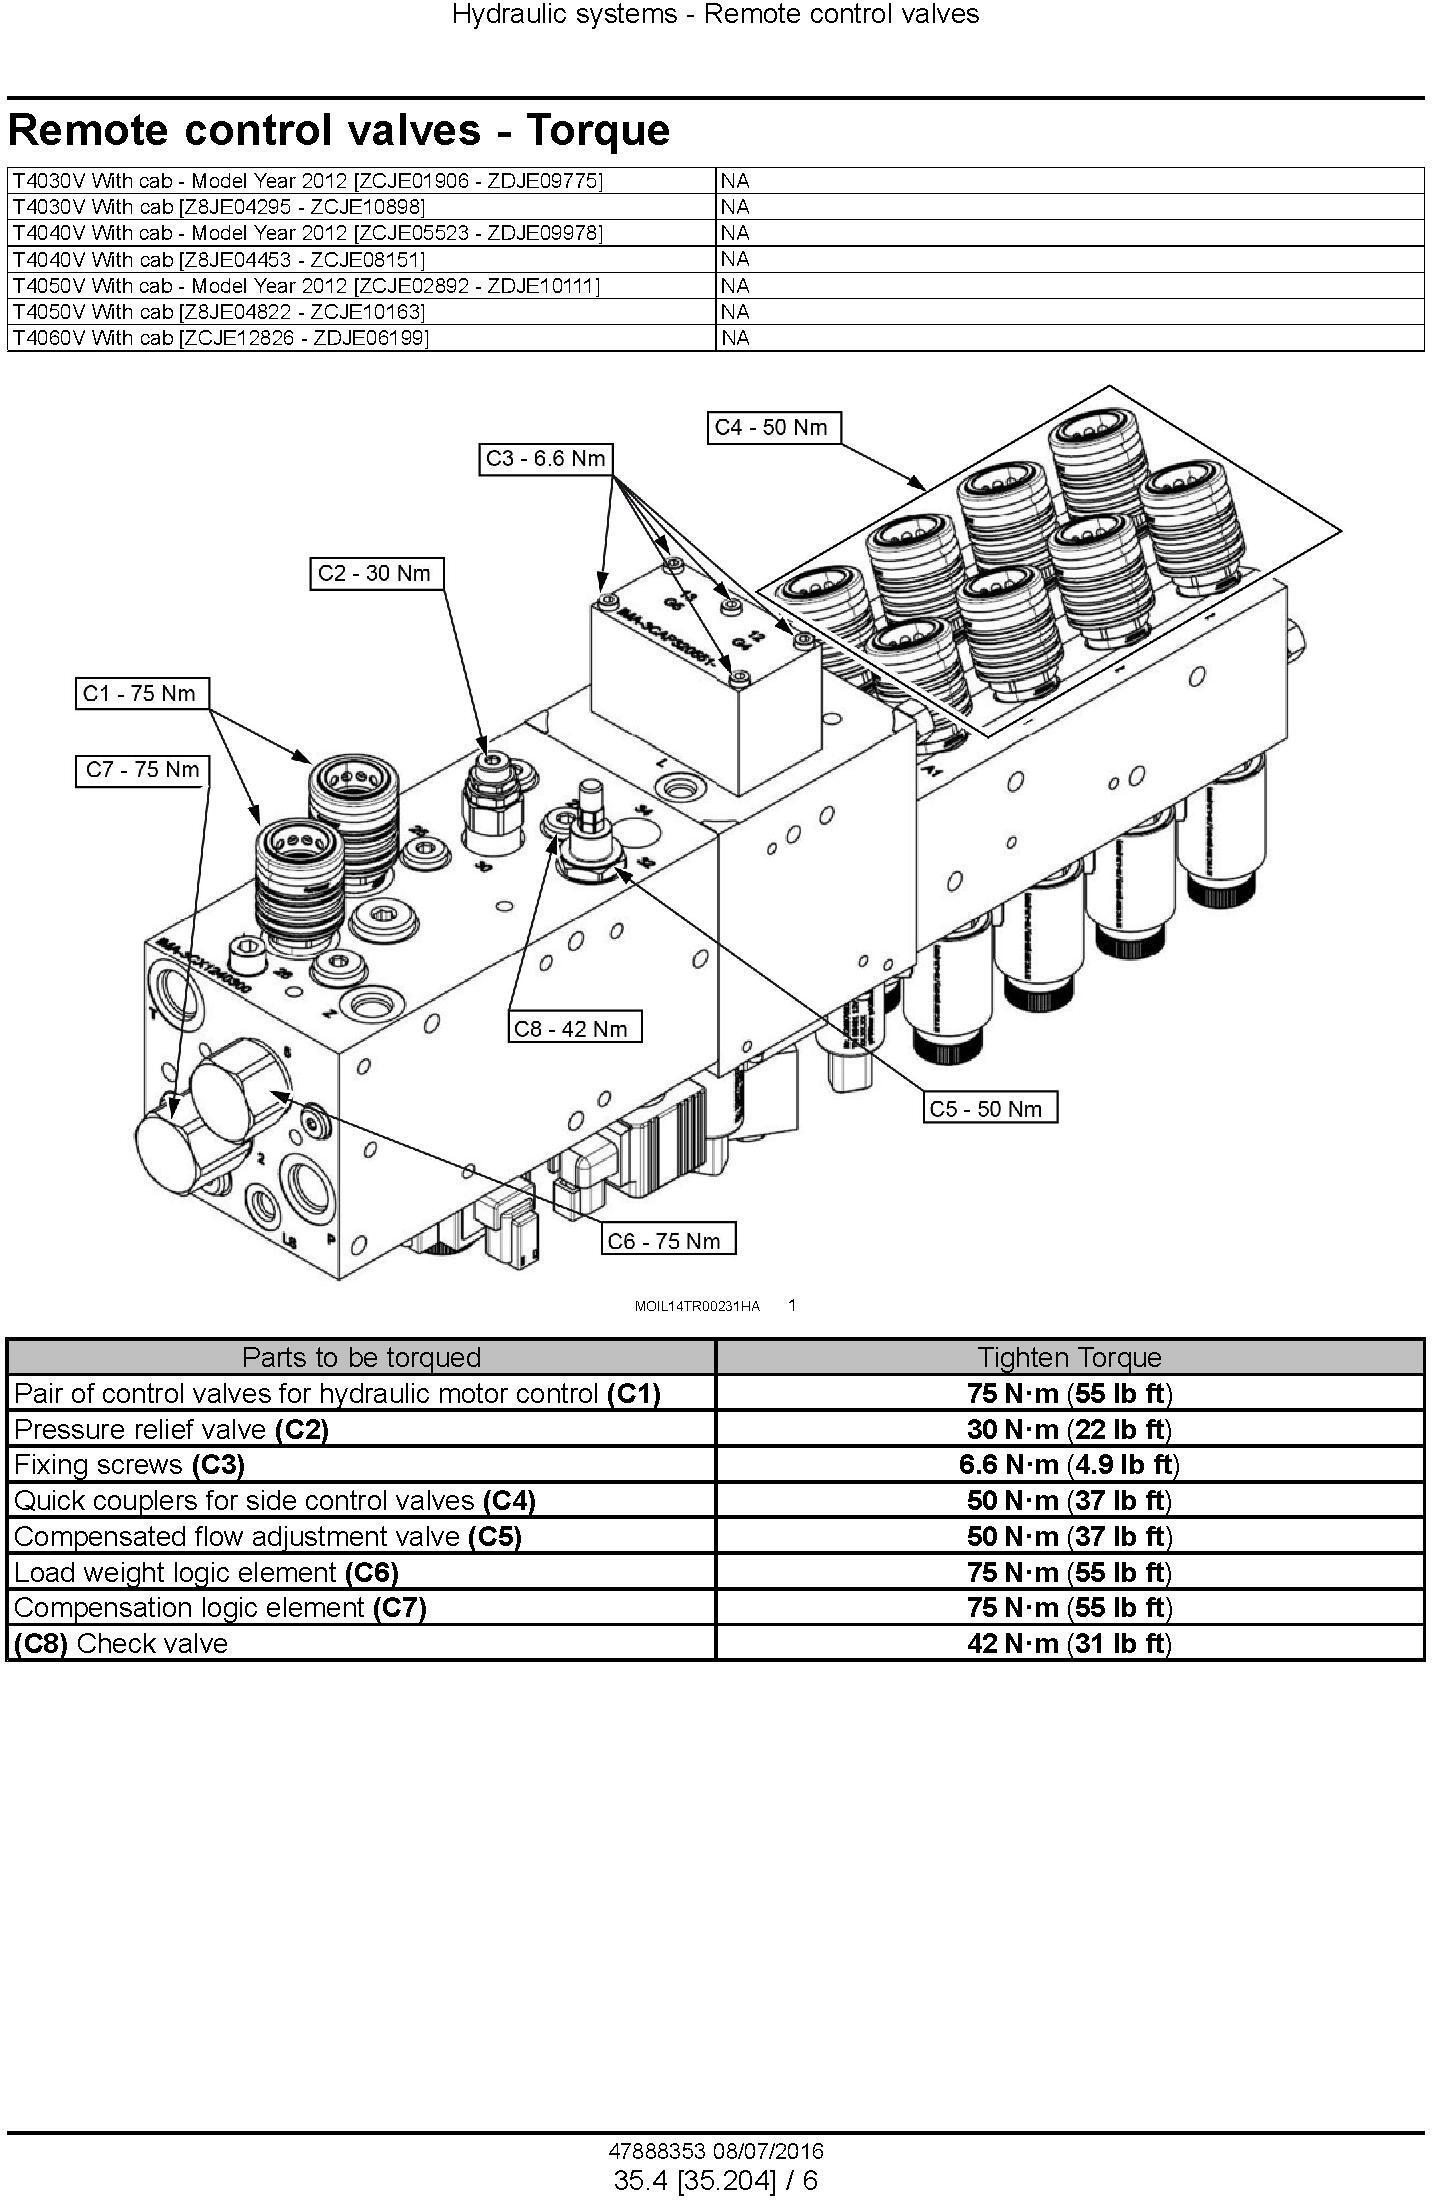 New Holland T4030V, T4040V, T4050V, T4060V Tier 3 Tractor Complete Service Manual (North America) - 2